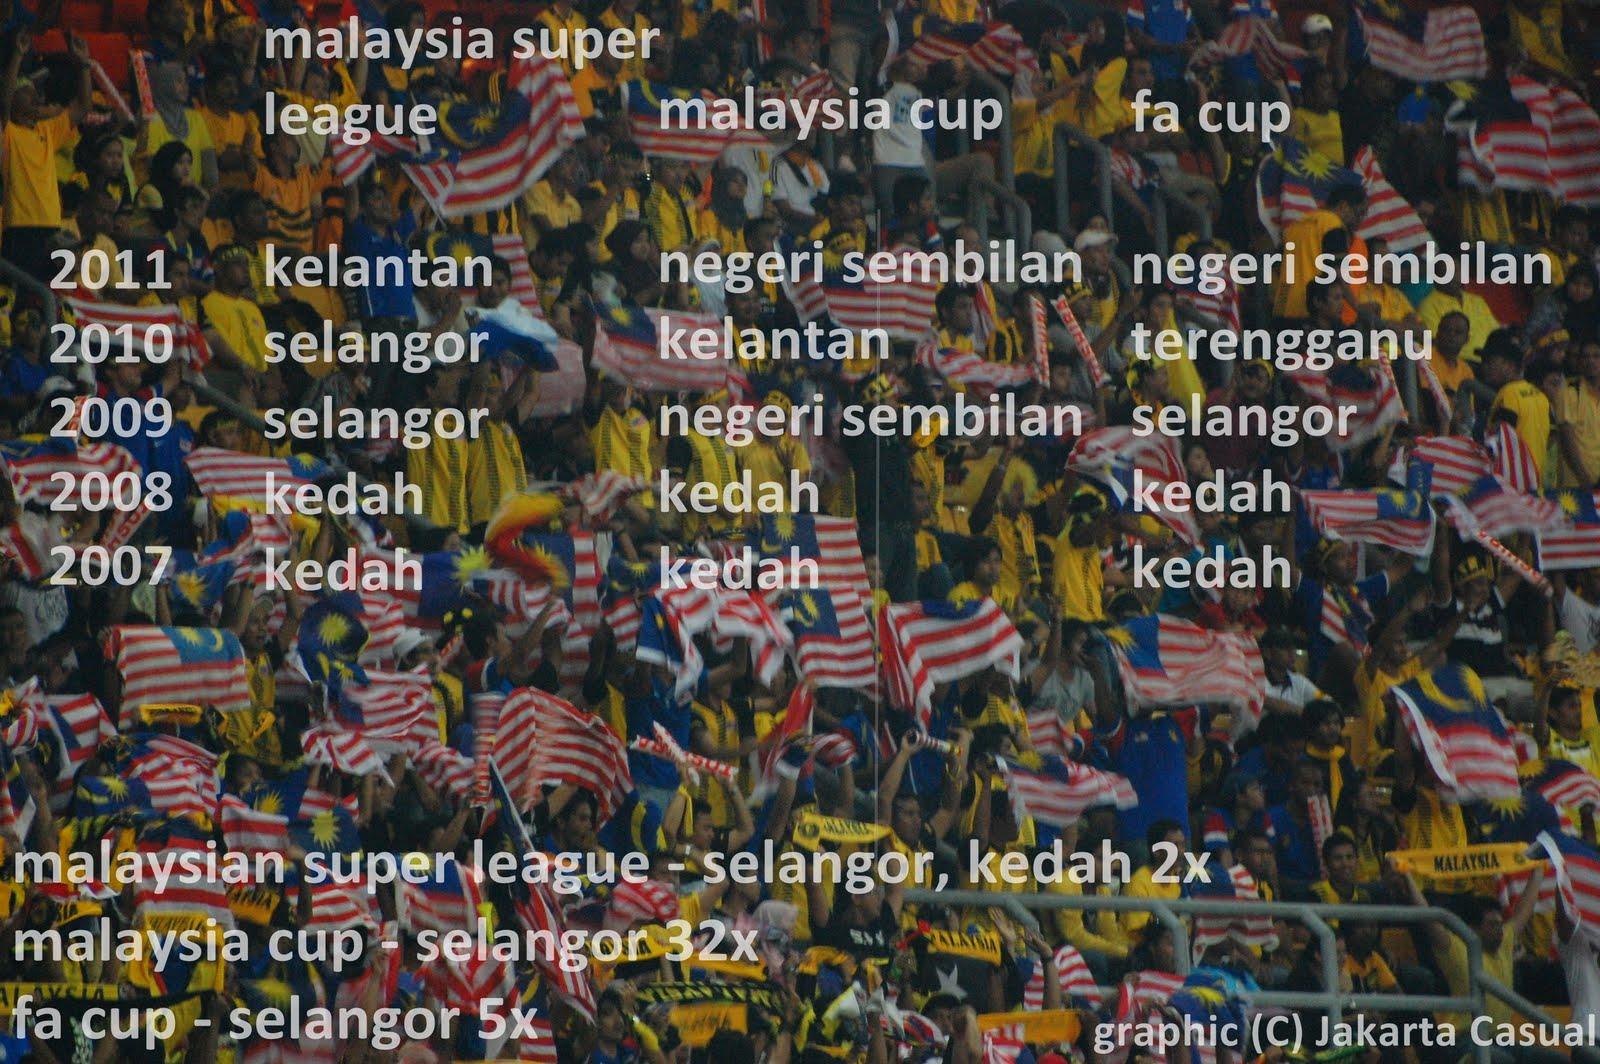 Jakarta Casual: Malaysia FA Cup Draw 2012